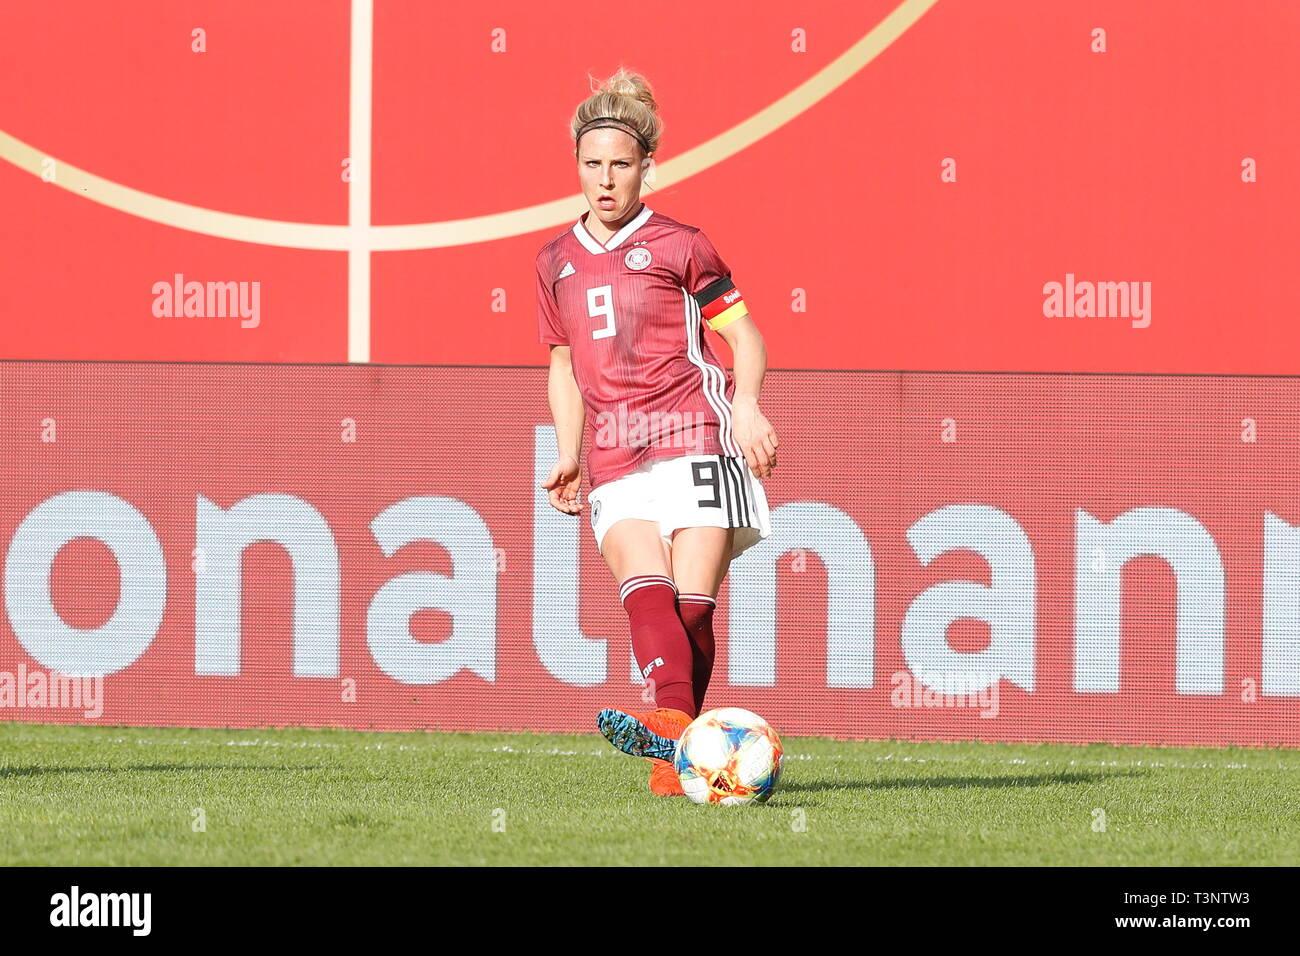 Svenja Huth (GER), APRIL 9, 2019 - Football / Soccer : International Friendly match between Germany 2-2 Japan at the Benteler-Arena in Paderborn, Germany. (Photo by Mutsu Kawamori/AFLO) - Stock Image